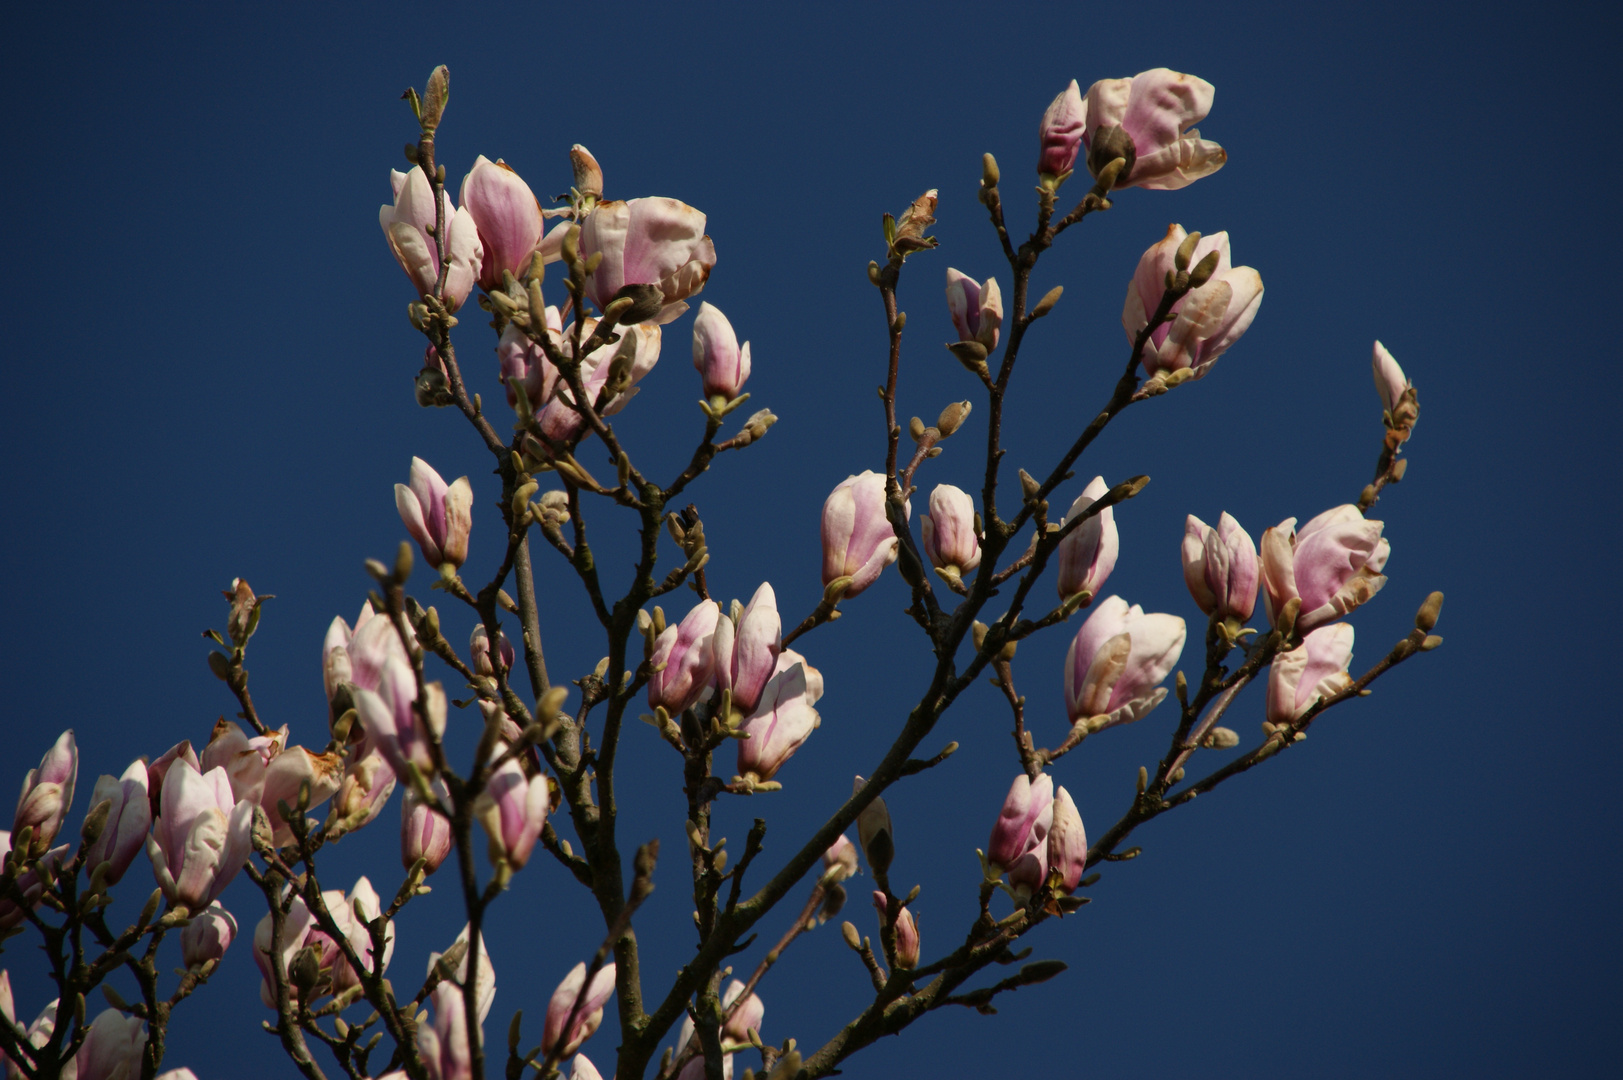 Magnolienpracht